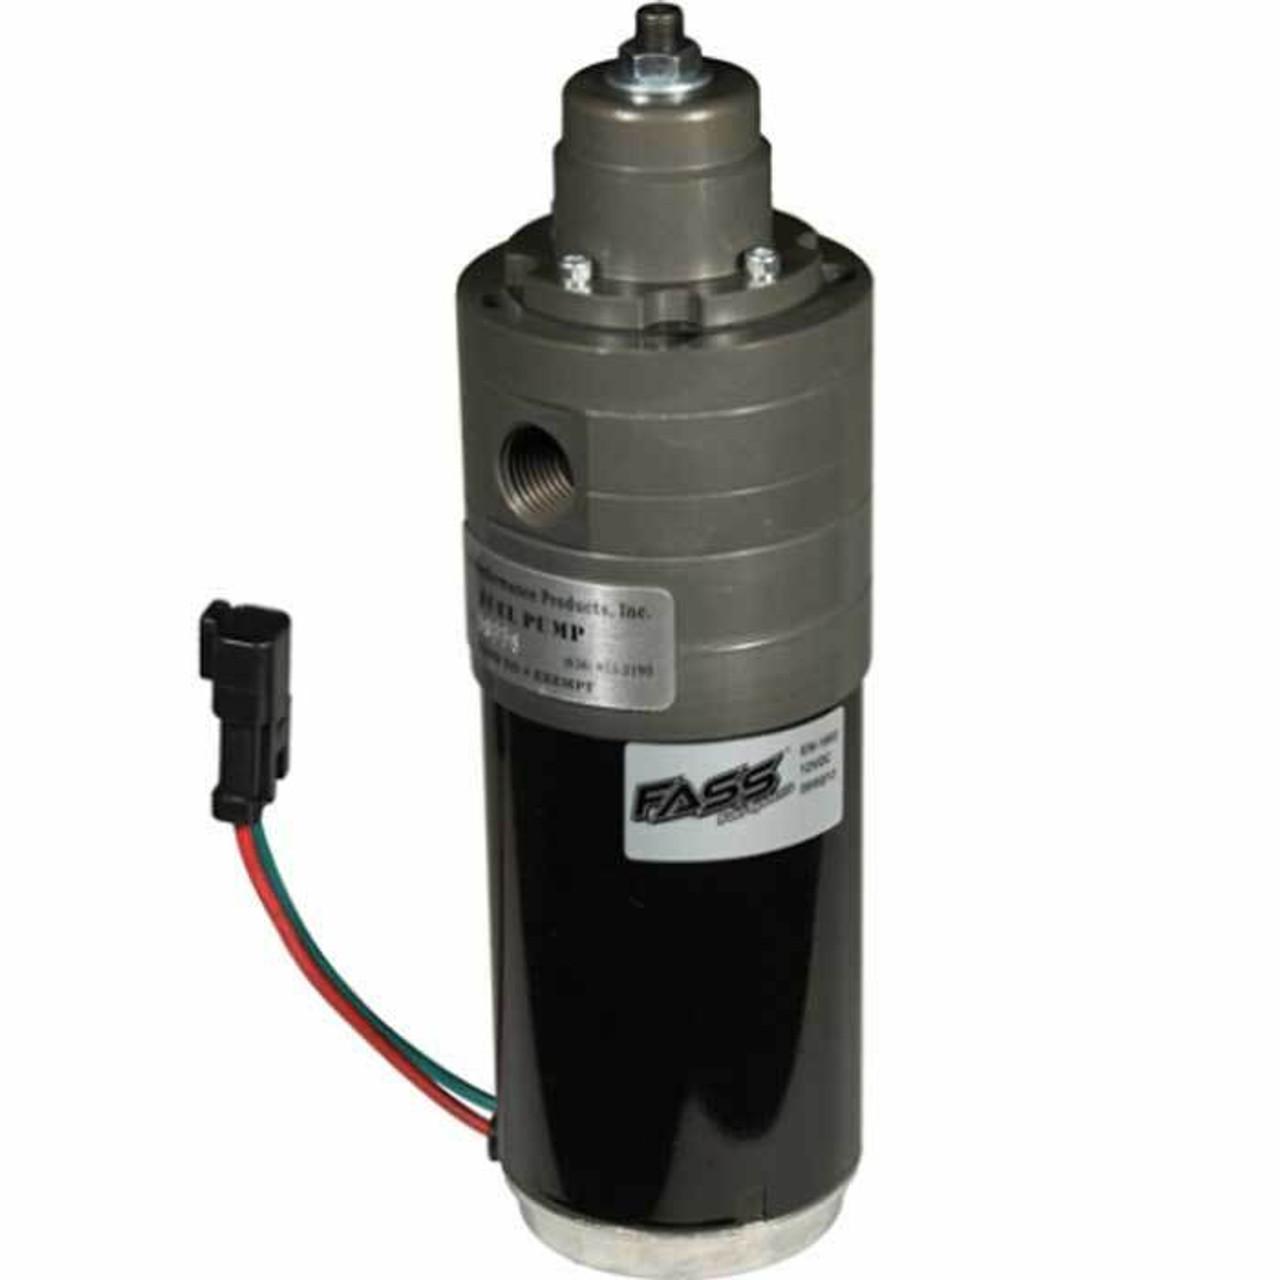 FASS ADJUSTABLE FUEL PUMP 99-07 FORD POWERSTROKE F250/F350 DIESEL 6.0L 140 GPH